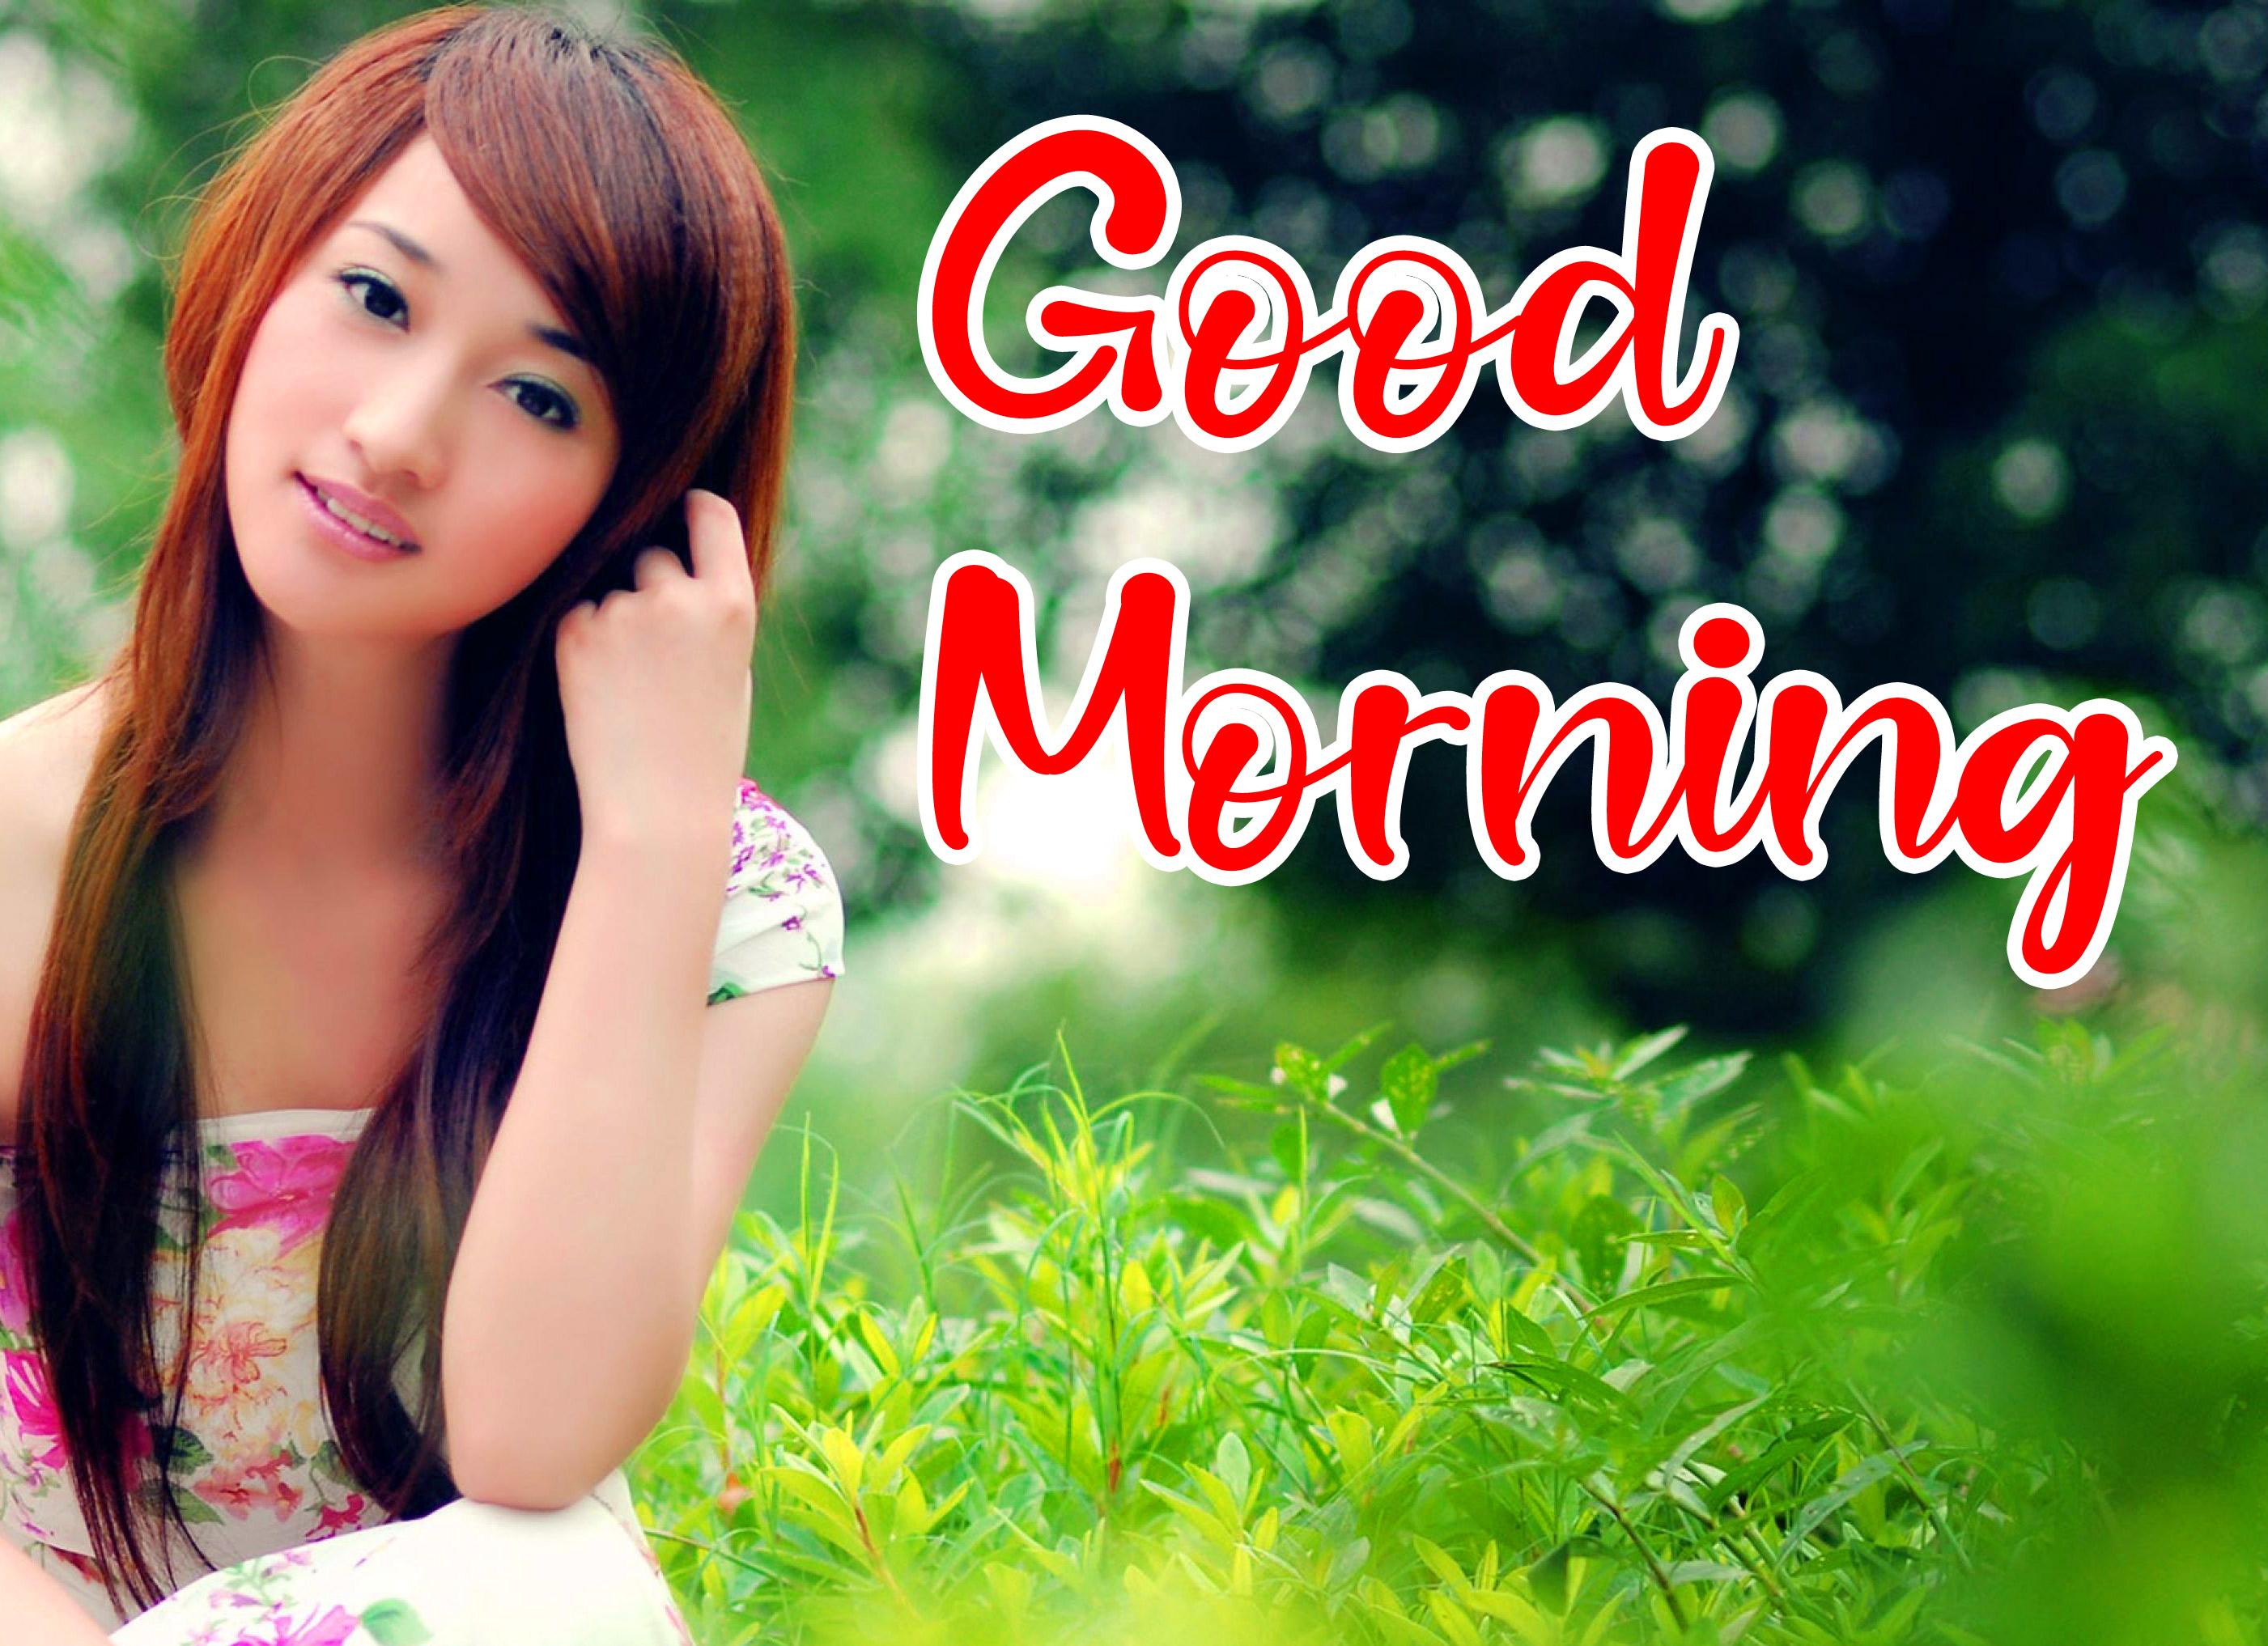 good morning Images for girls 10